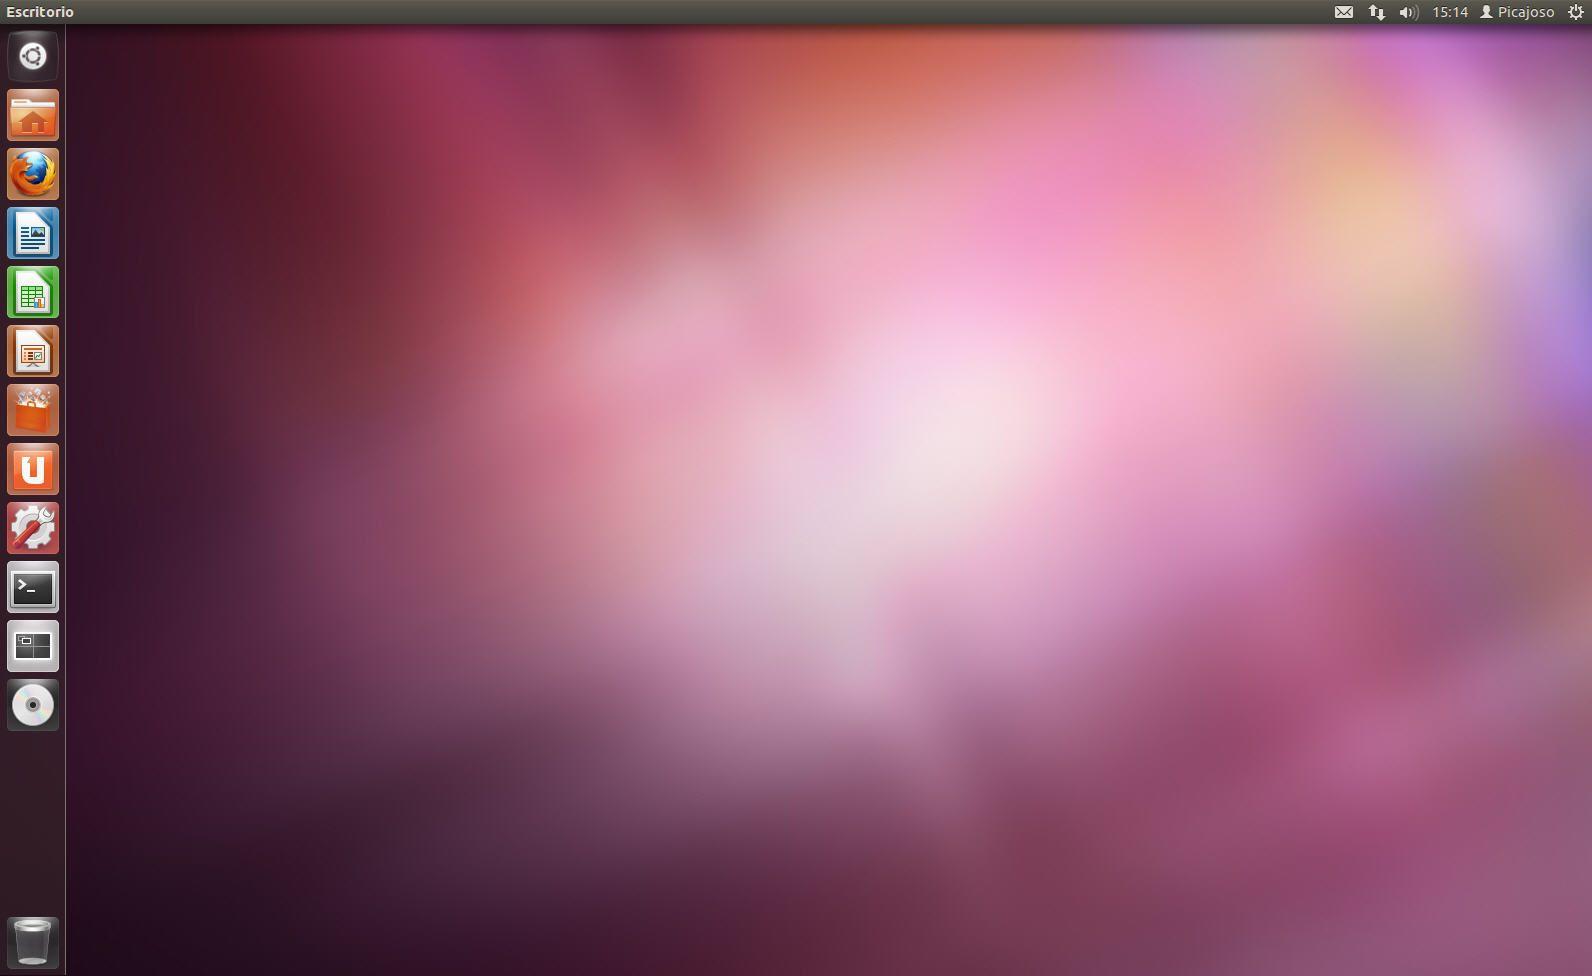 descargar ubuntu 11.10 en espanol gratis